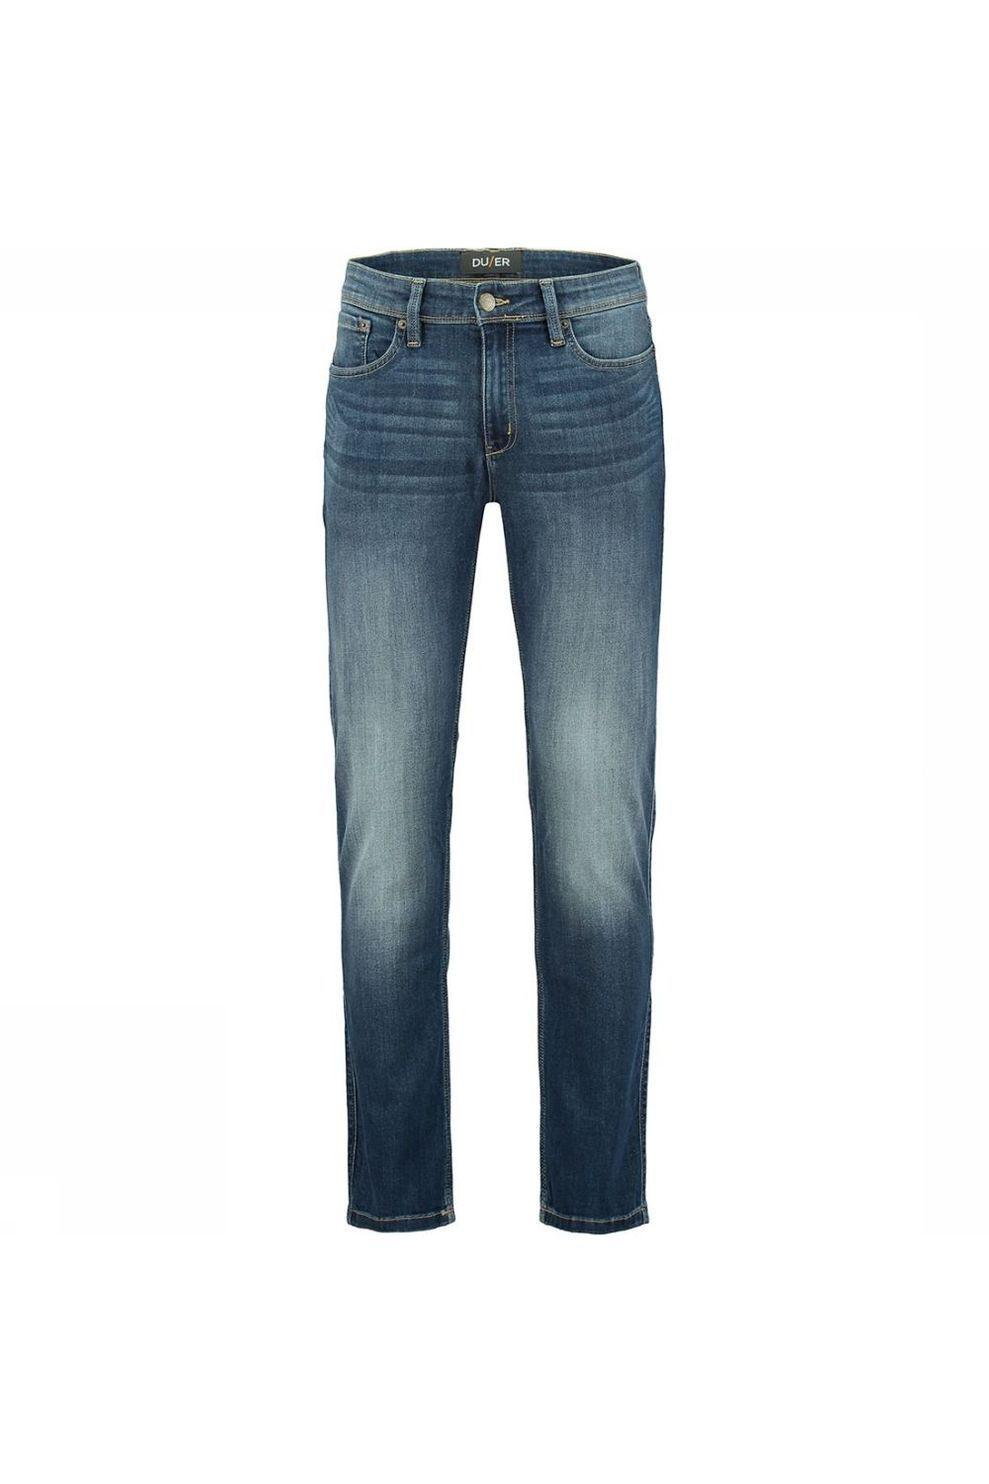 Duer L2X Performance Denim Slim Fit Jeans Denim / Jeans/Lichtblauw